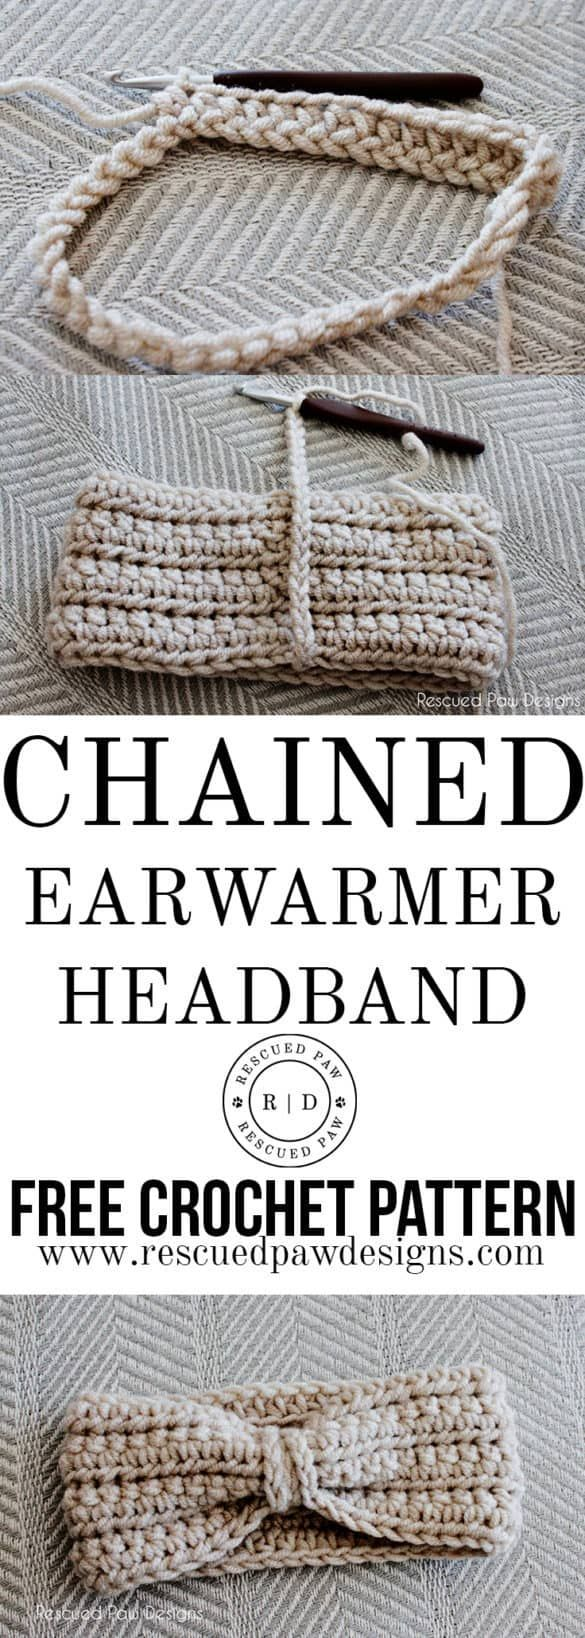 Crochet Chained Ear Warmer Pattern by Rescued Paw Designs | Diademas ...